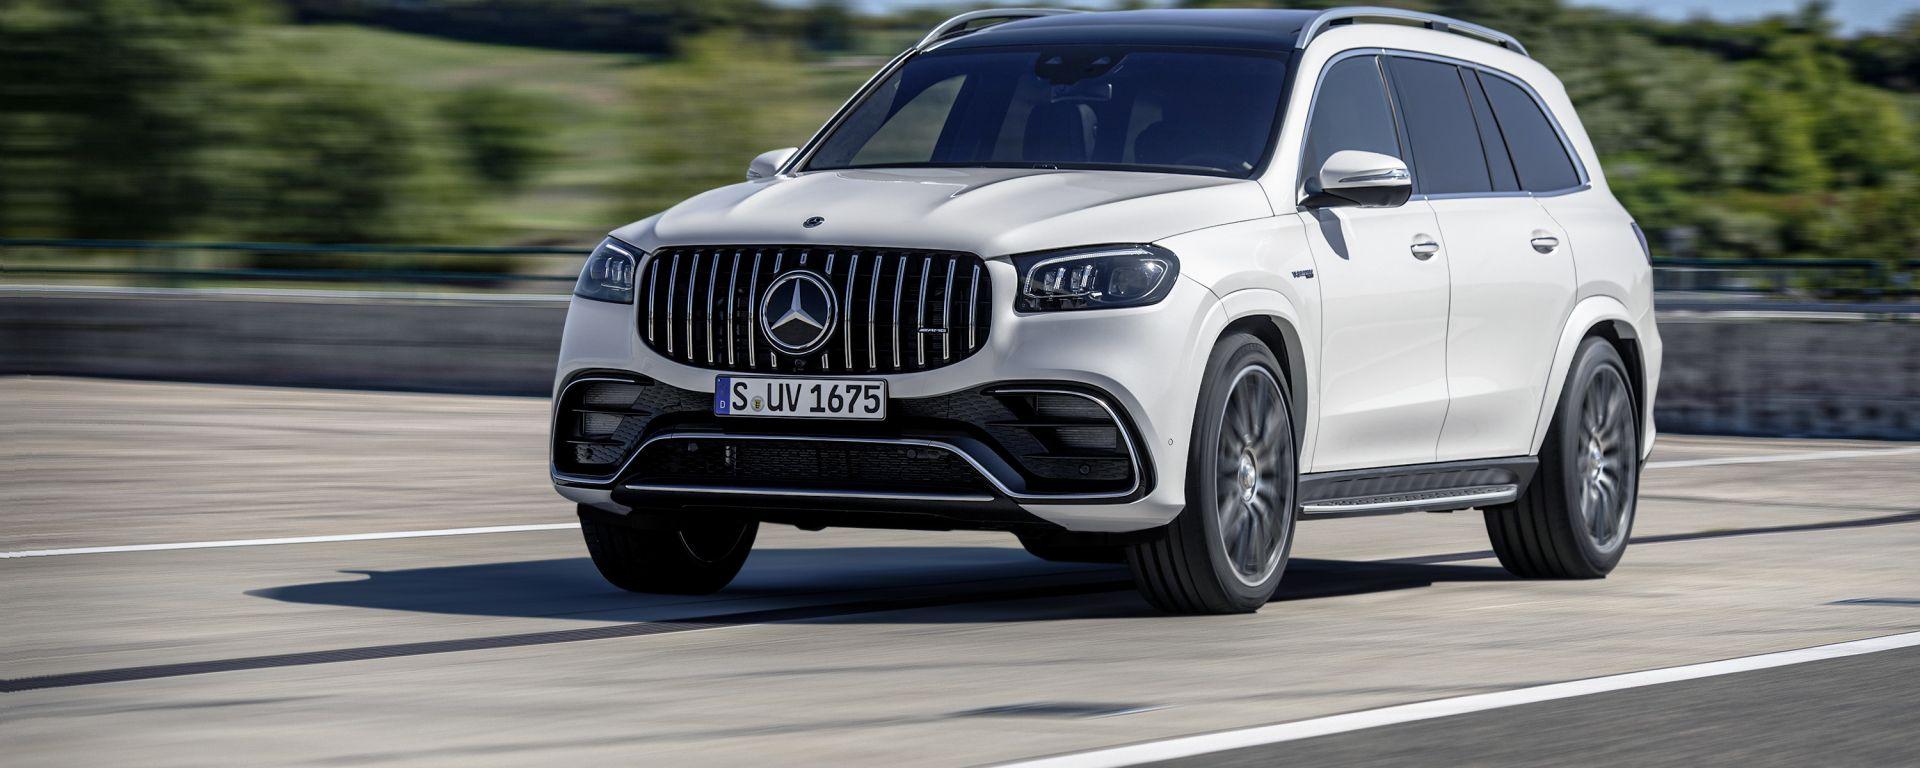 Mercedes GLS e GLE AMG: entrano a listino i SUV sportivi tedeschi. La GLS 63 AMG